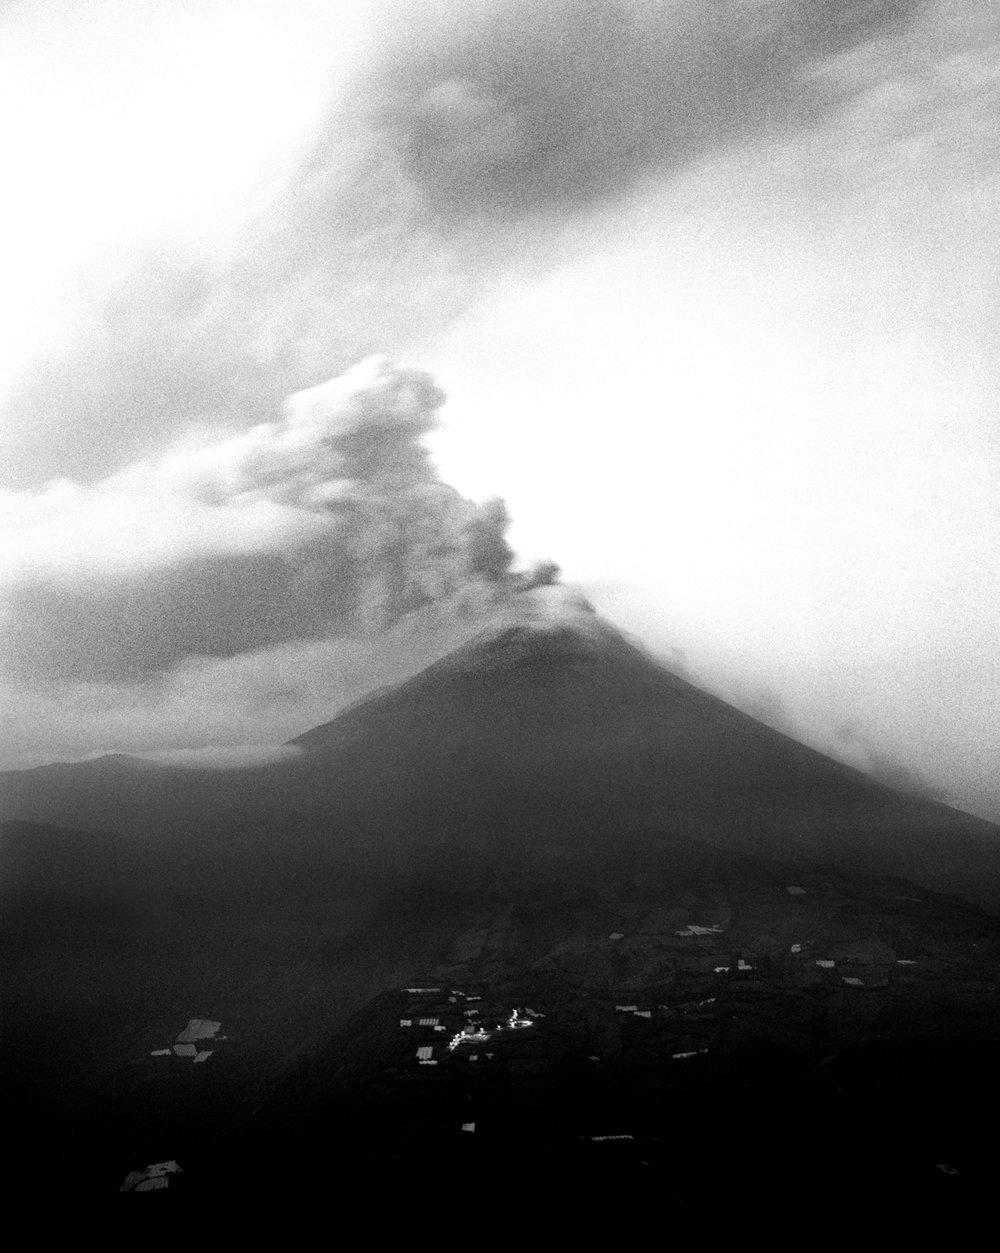 Tungurahua_031.jpg